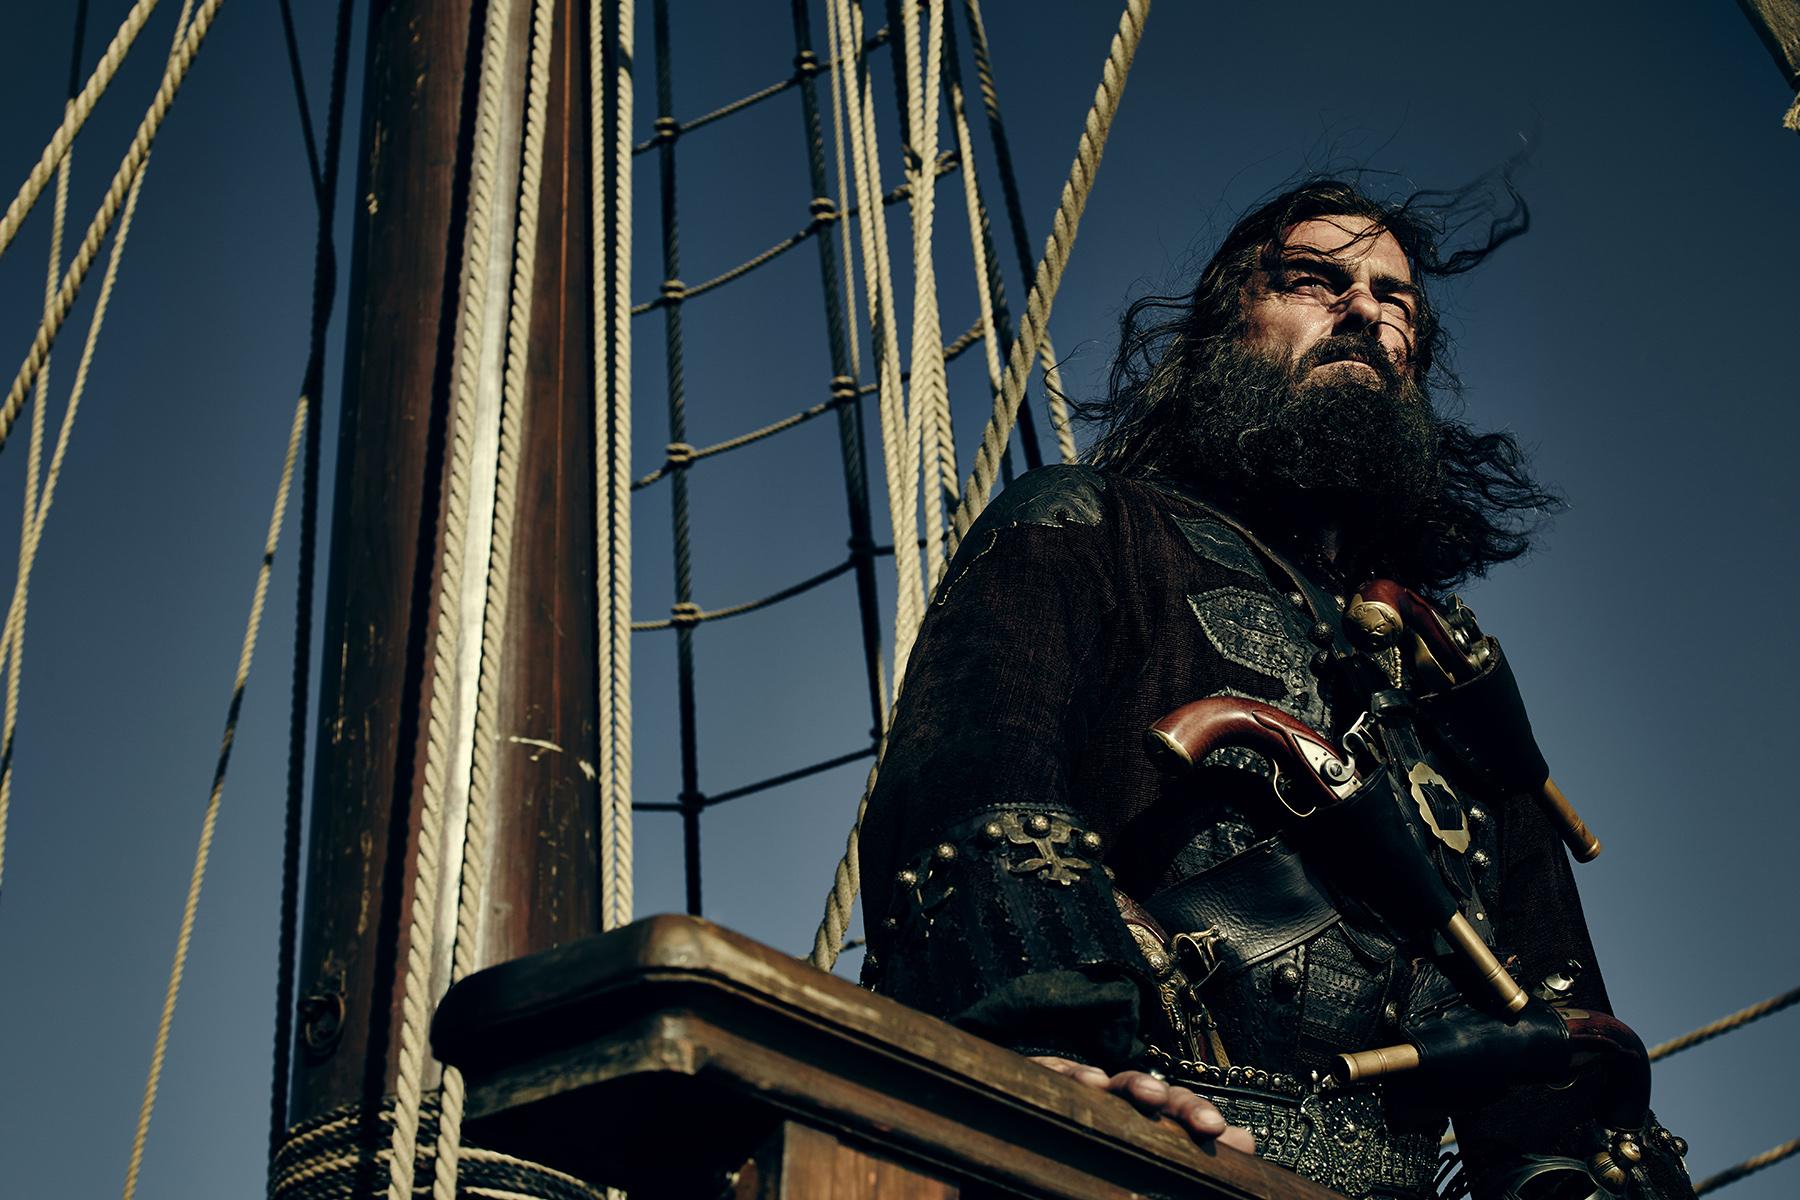 Black Sails: Ray Stevenson to Play Blackbeard | Variety